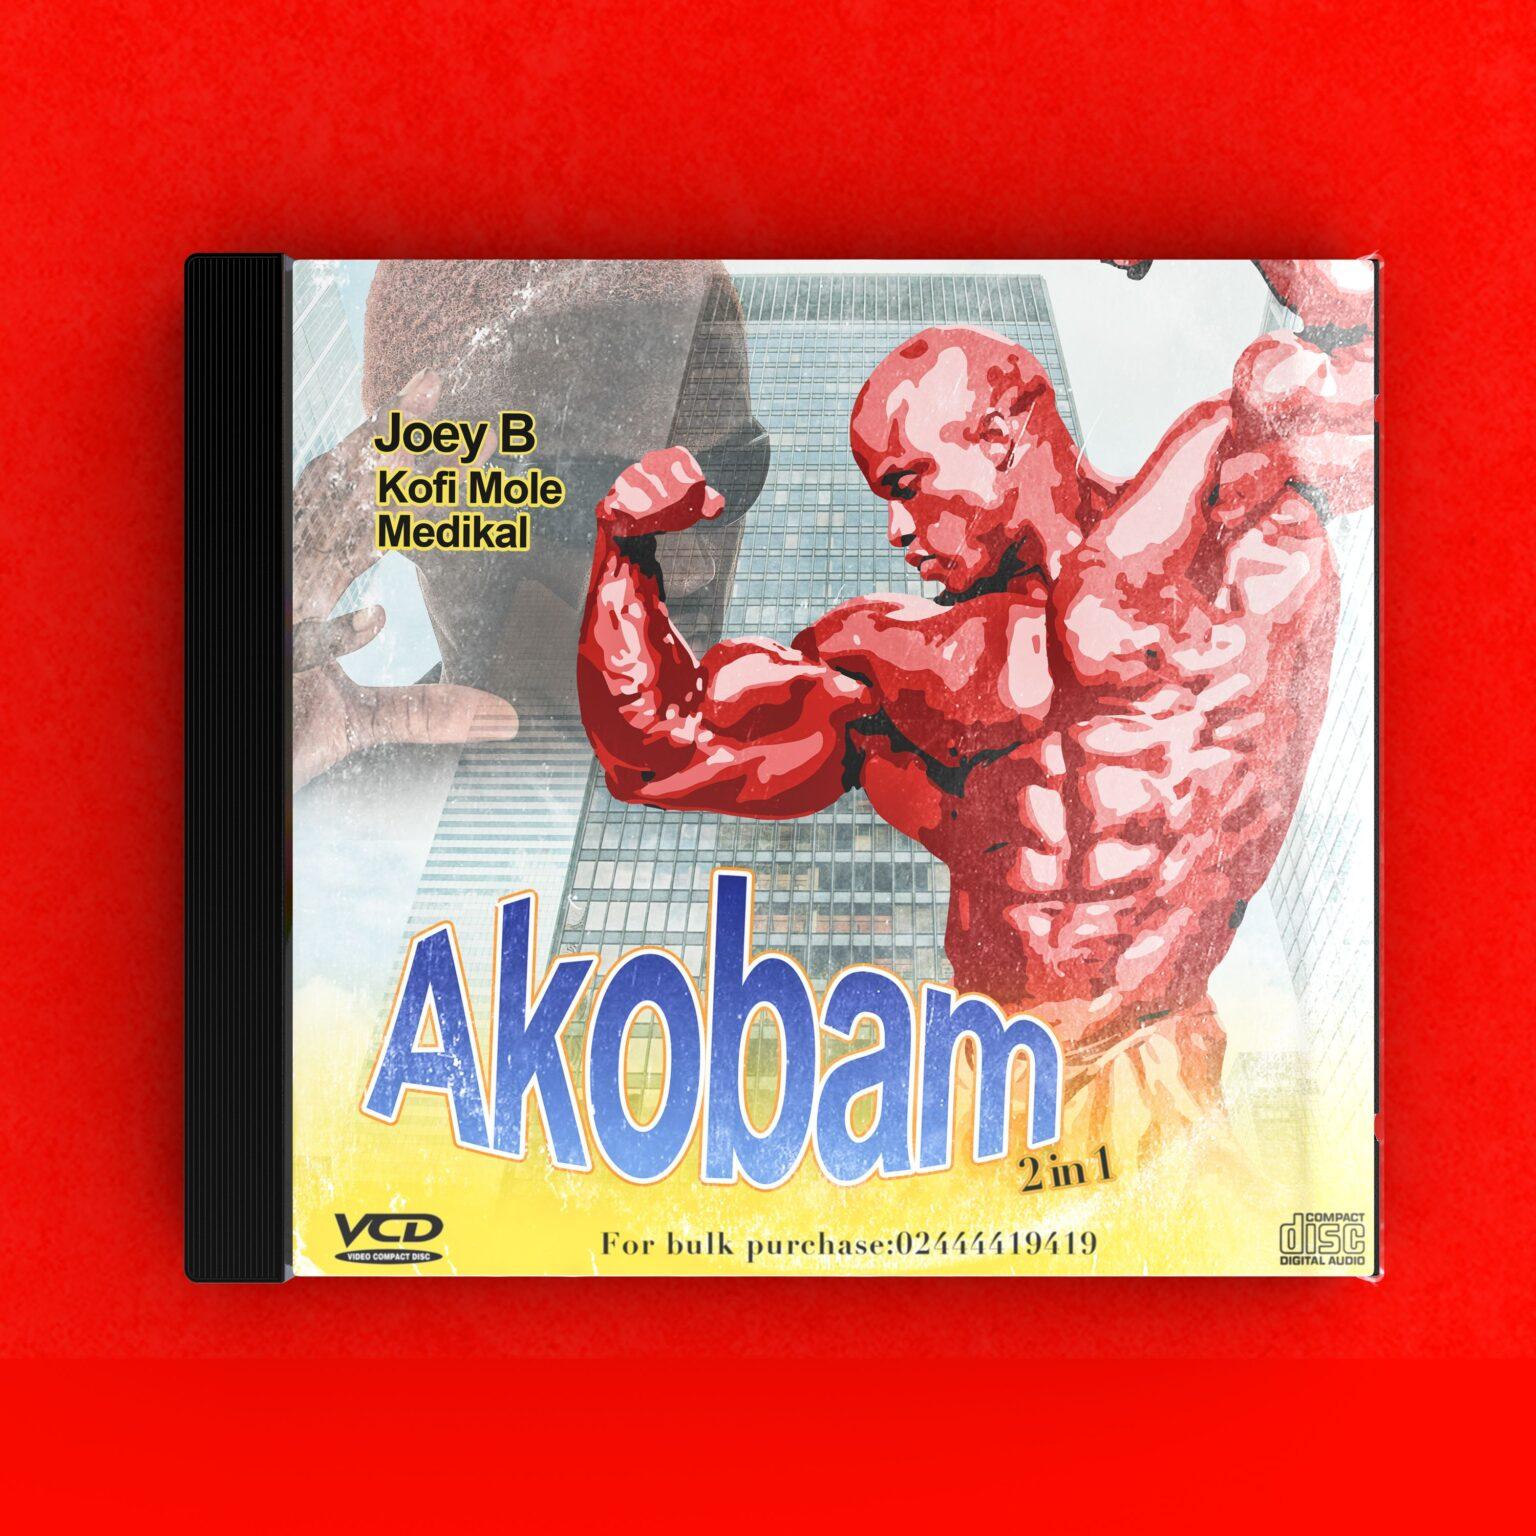 Download MP3: Joey B - Akobam Ft Medikal & Kofi Mole | Halmblog.com